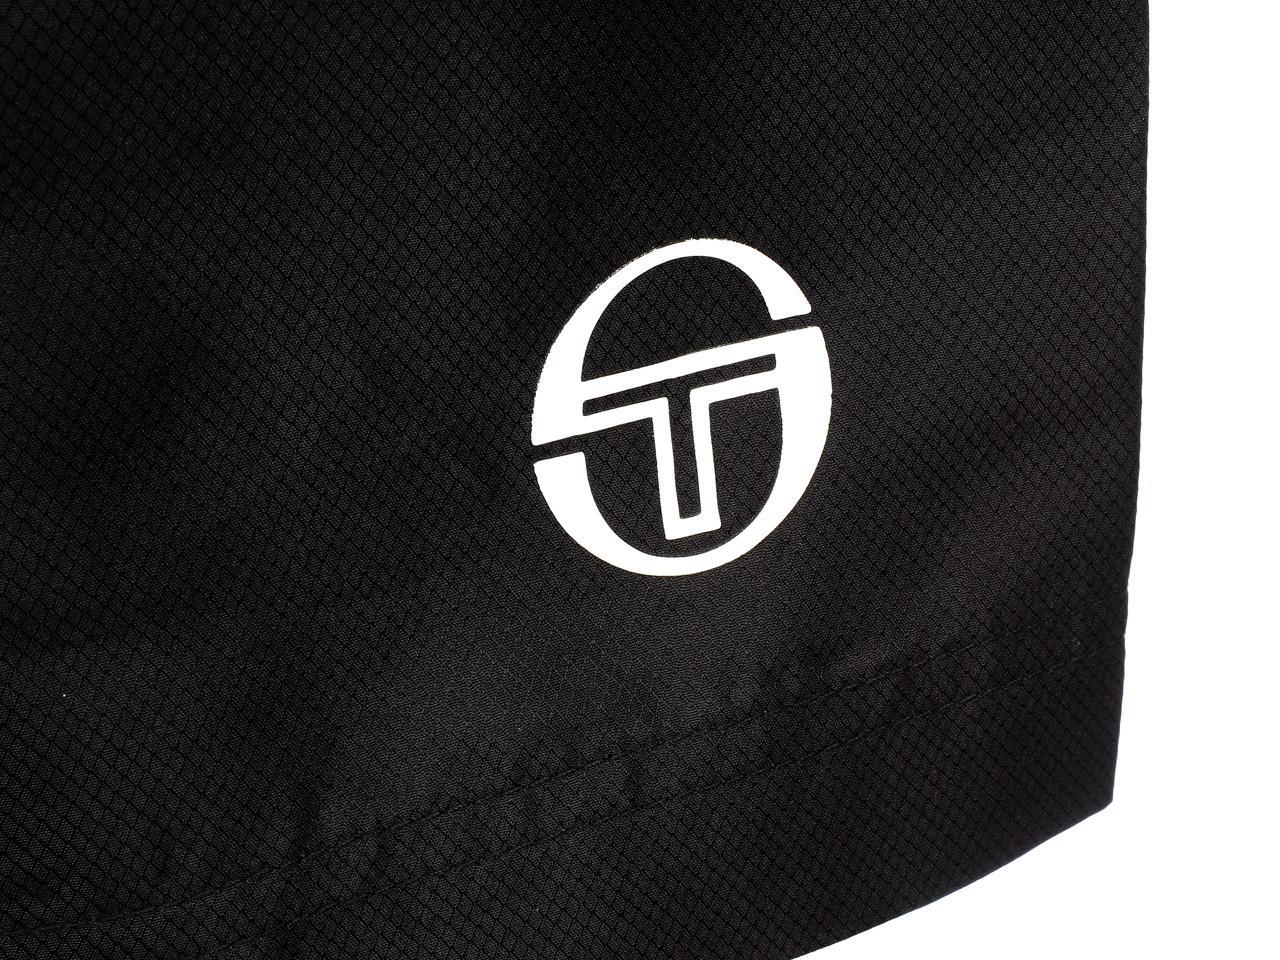 Bermuda-Shorts-Sergio-Tacchini-Rob-017-Black-Black-Shorts-45018-New thumbnail 3